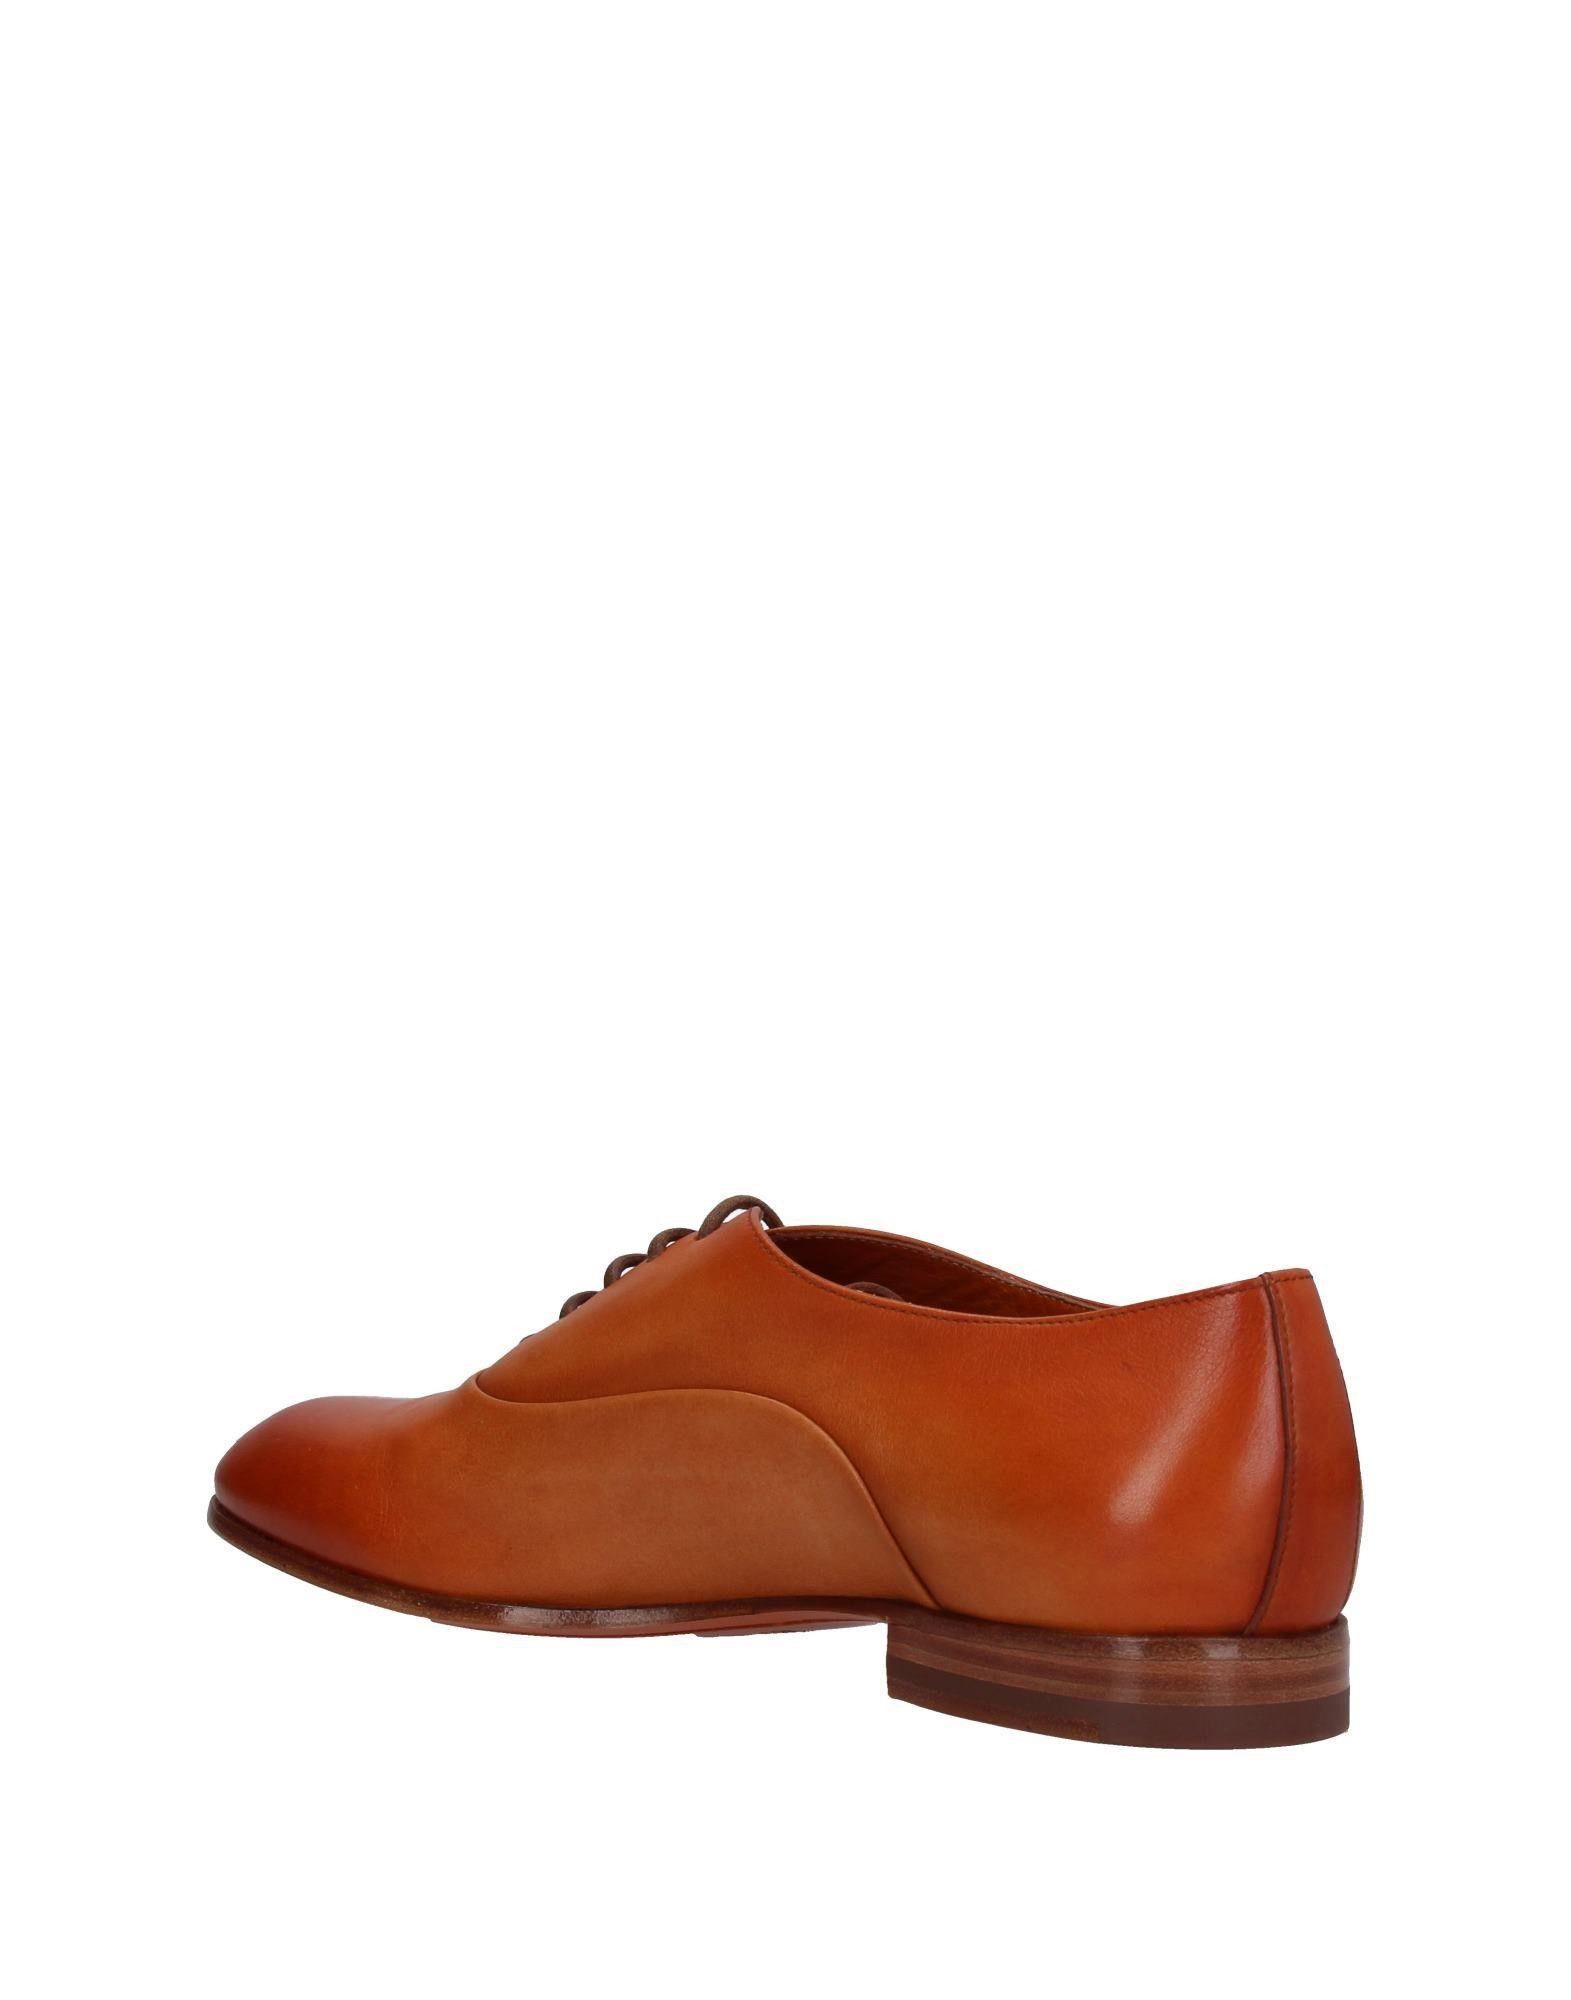 Santoni Schnürschuhe Schnürschuhe Santoni Damen  11387642VD Heiße Schuhe 999d06